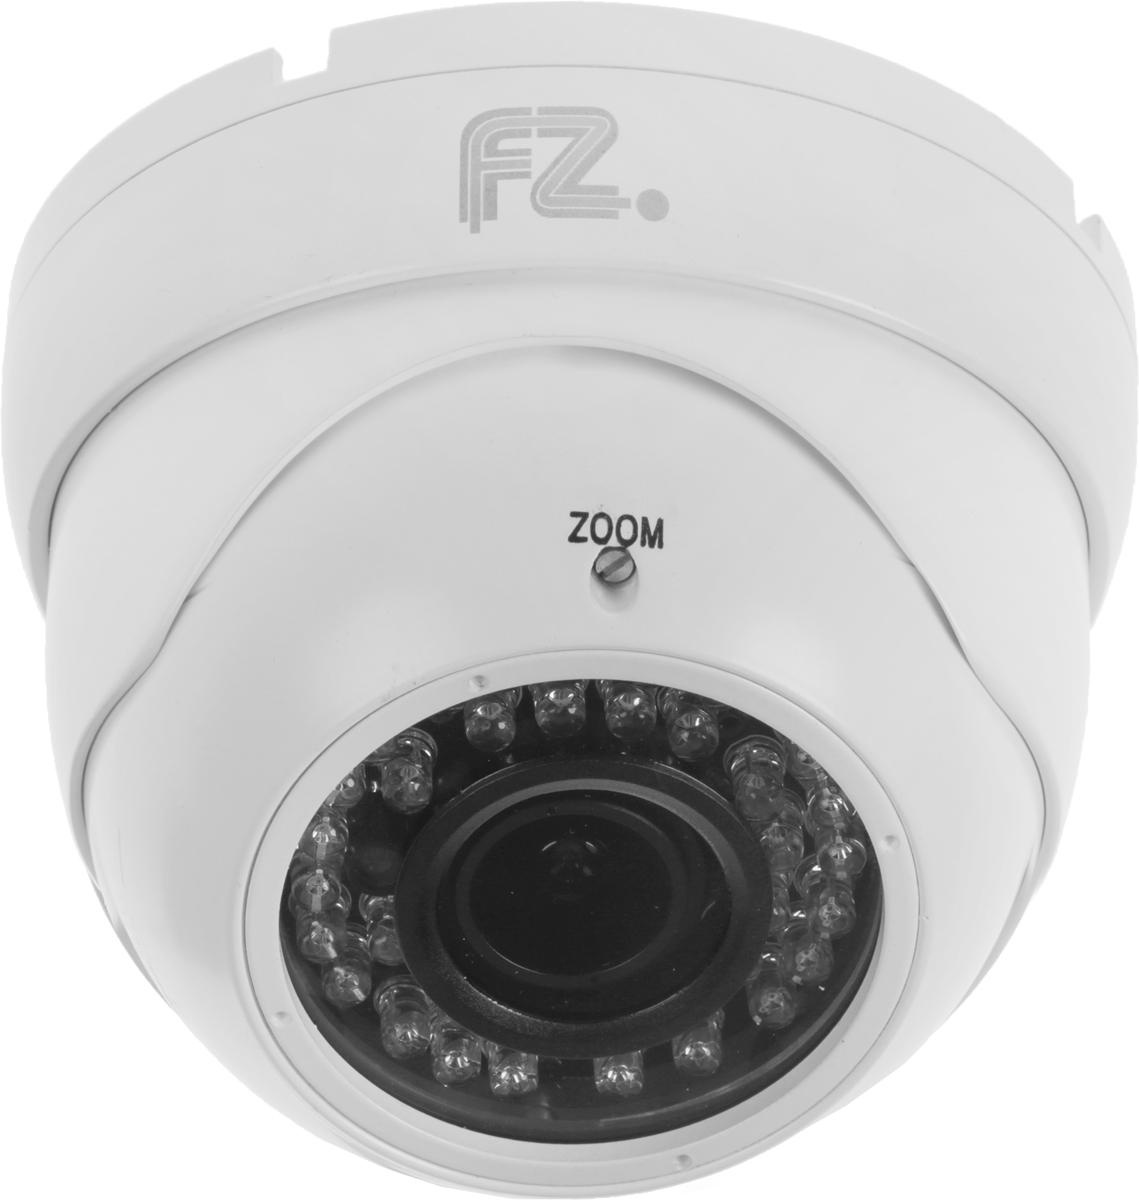 Fazera FZ-DVIR36-1080 камера видеонаблюдения - Камеры видеонаблюдения